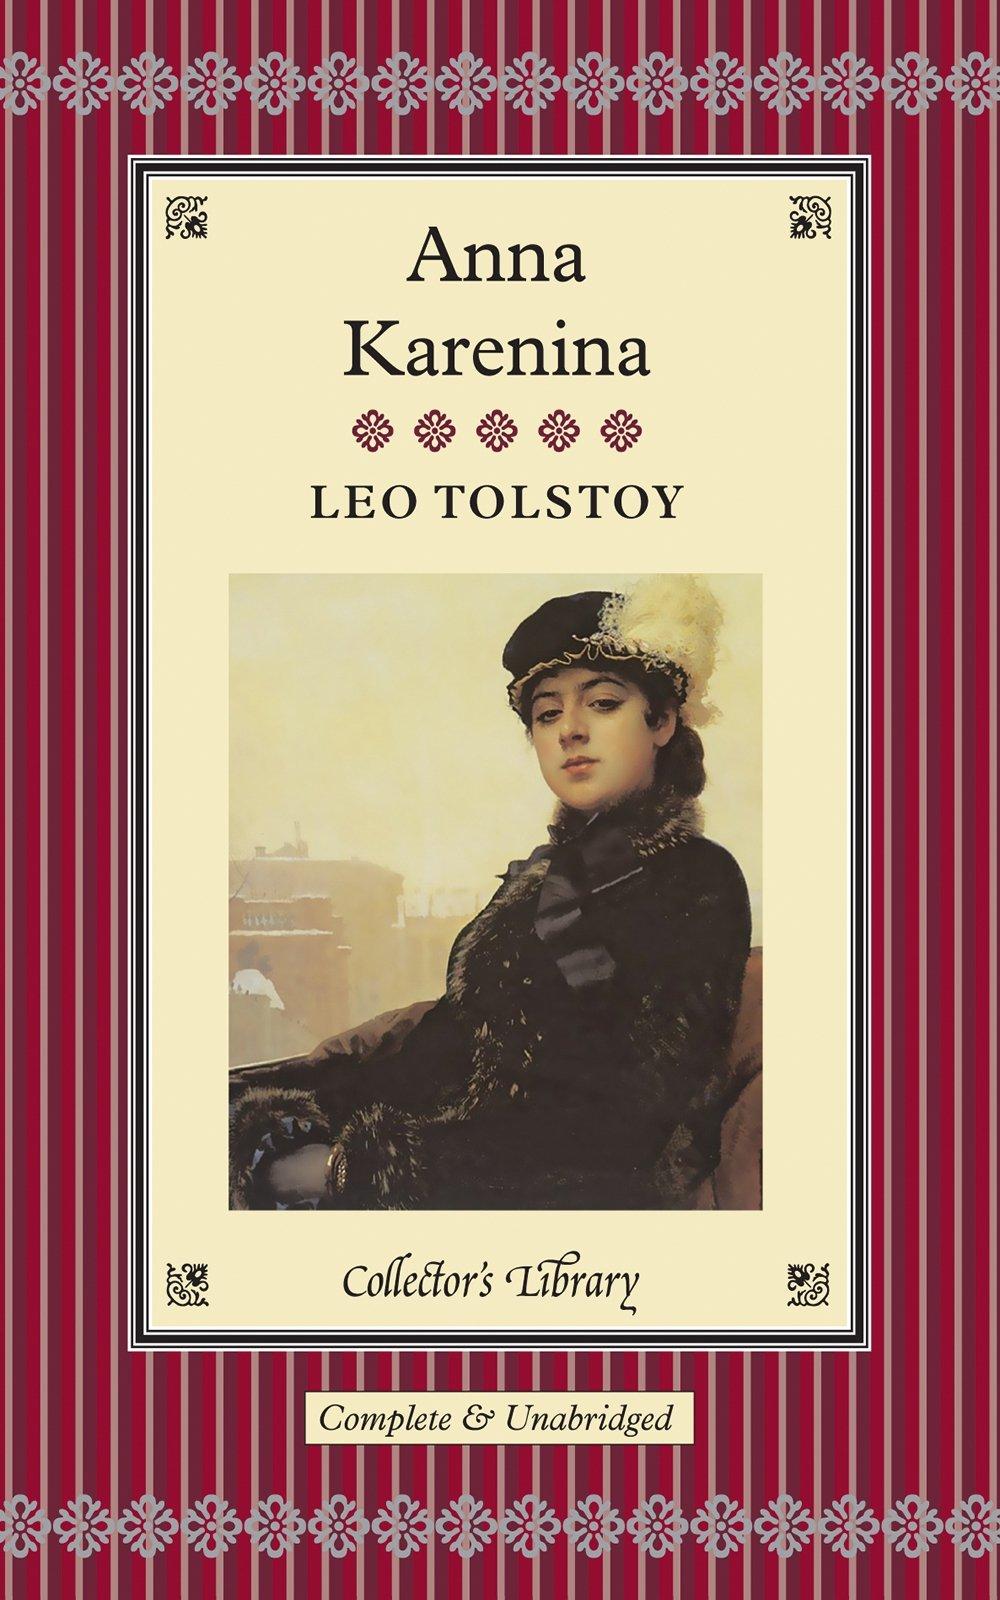 Anna Karenina (Collectors Library): Amazon.co.uk: Leo Tolstoy:  9781907360008: Books